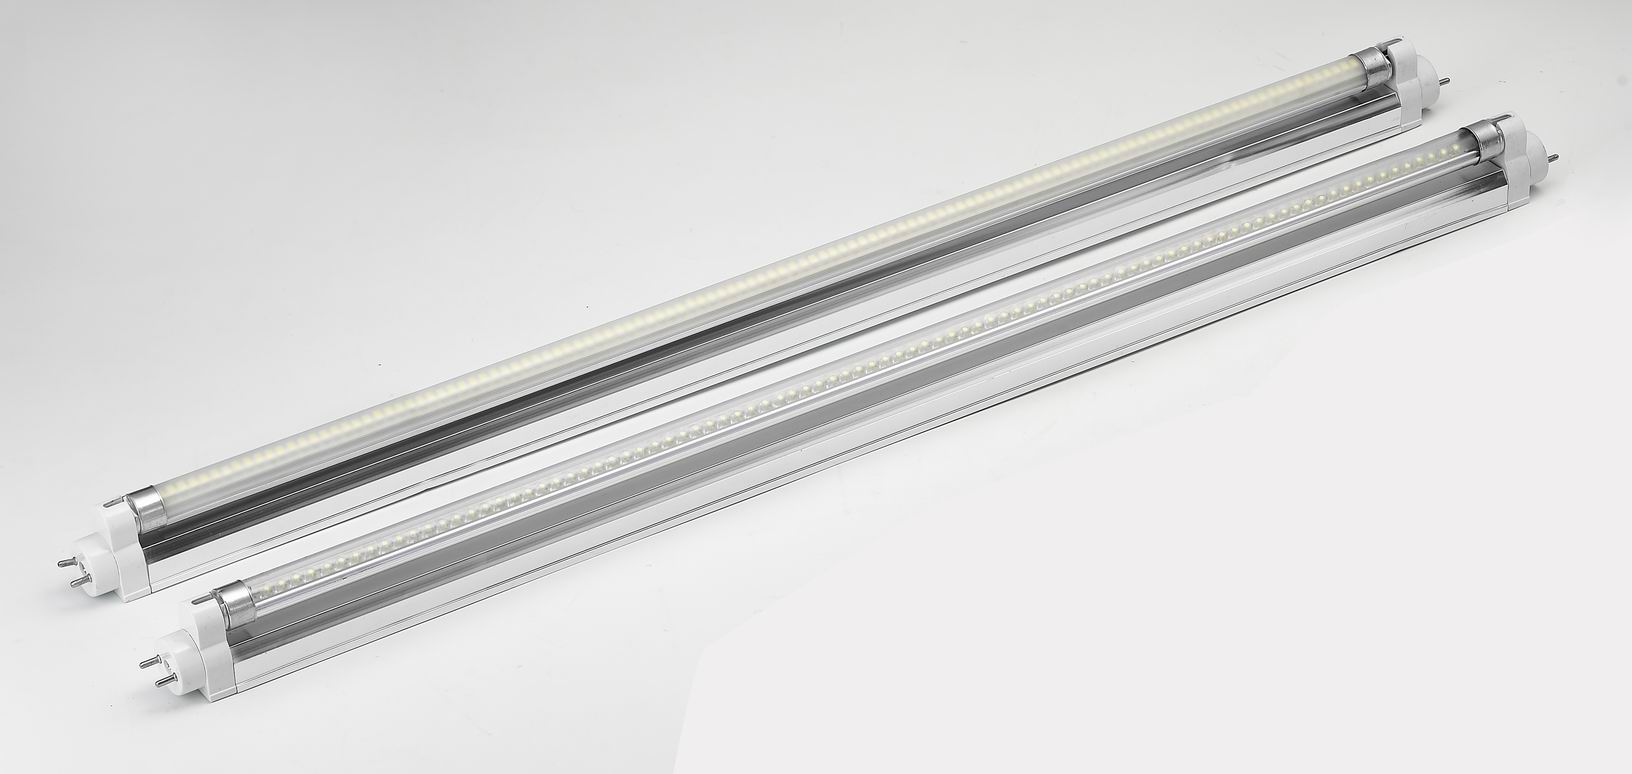 LED灯管接线示意图